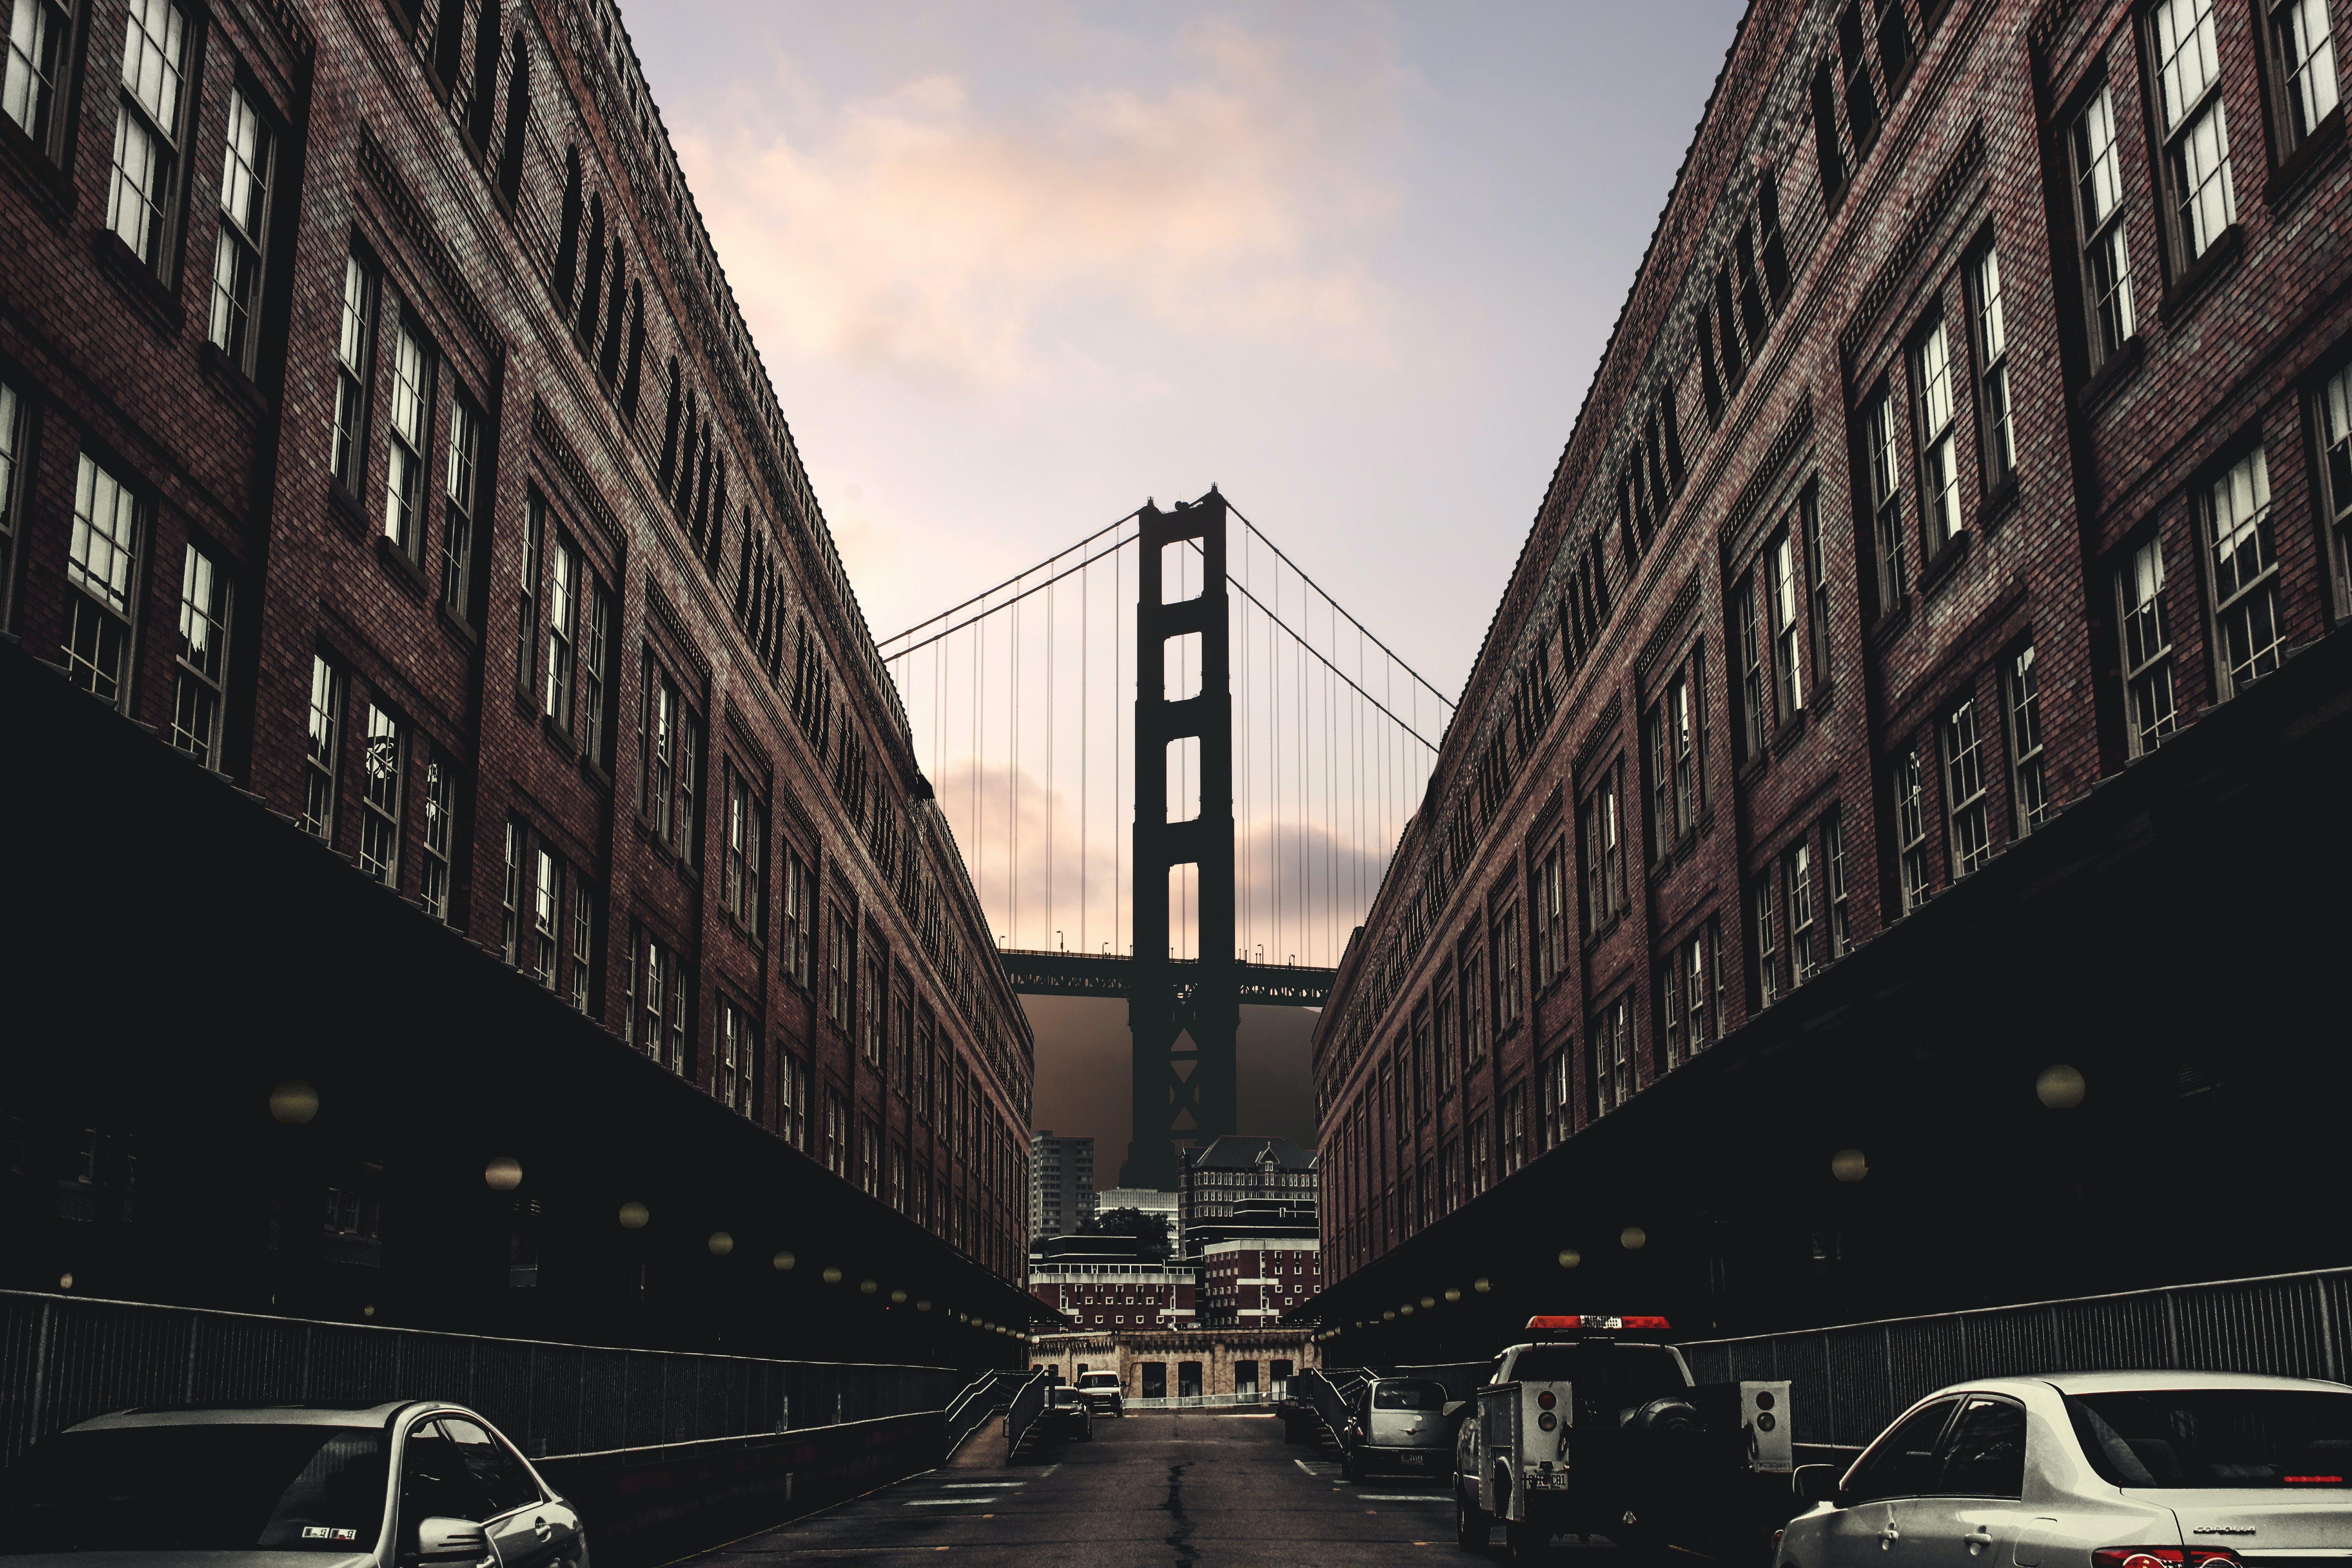 Free stock photo of architecture, bridge, building, business